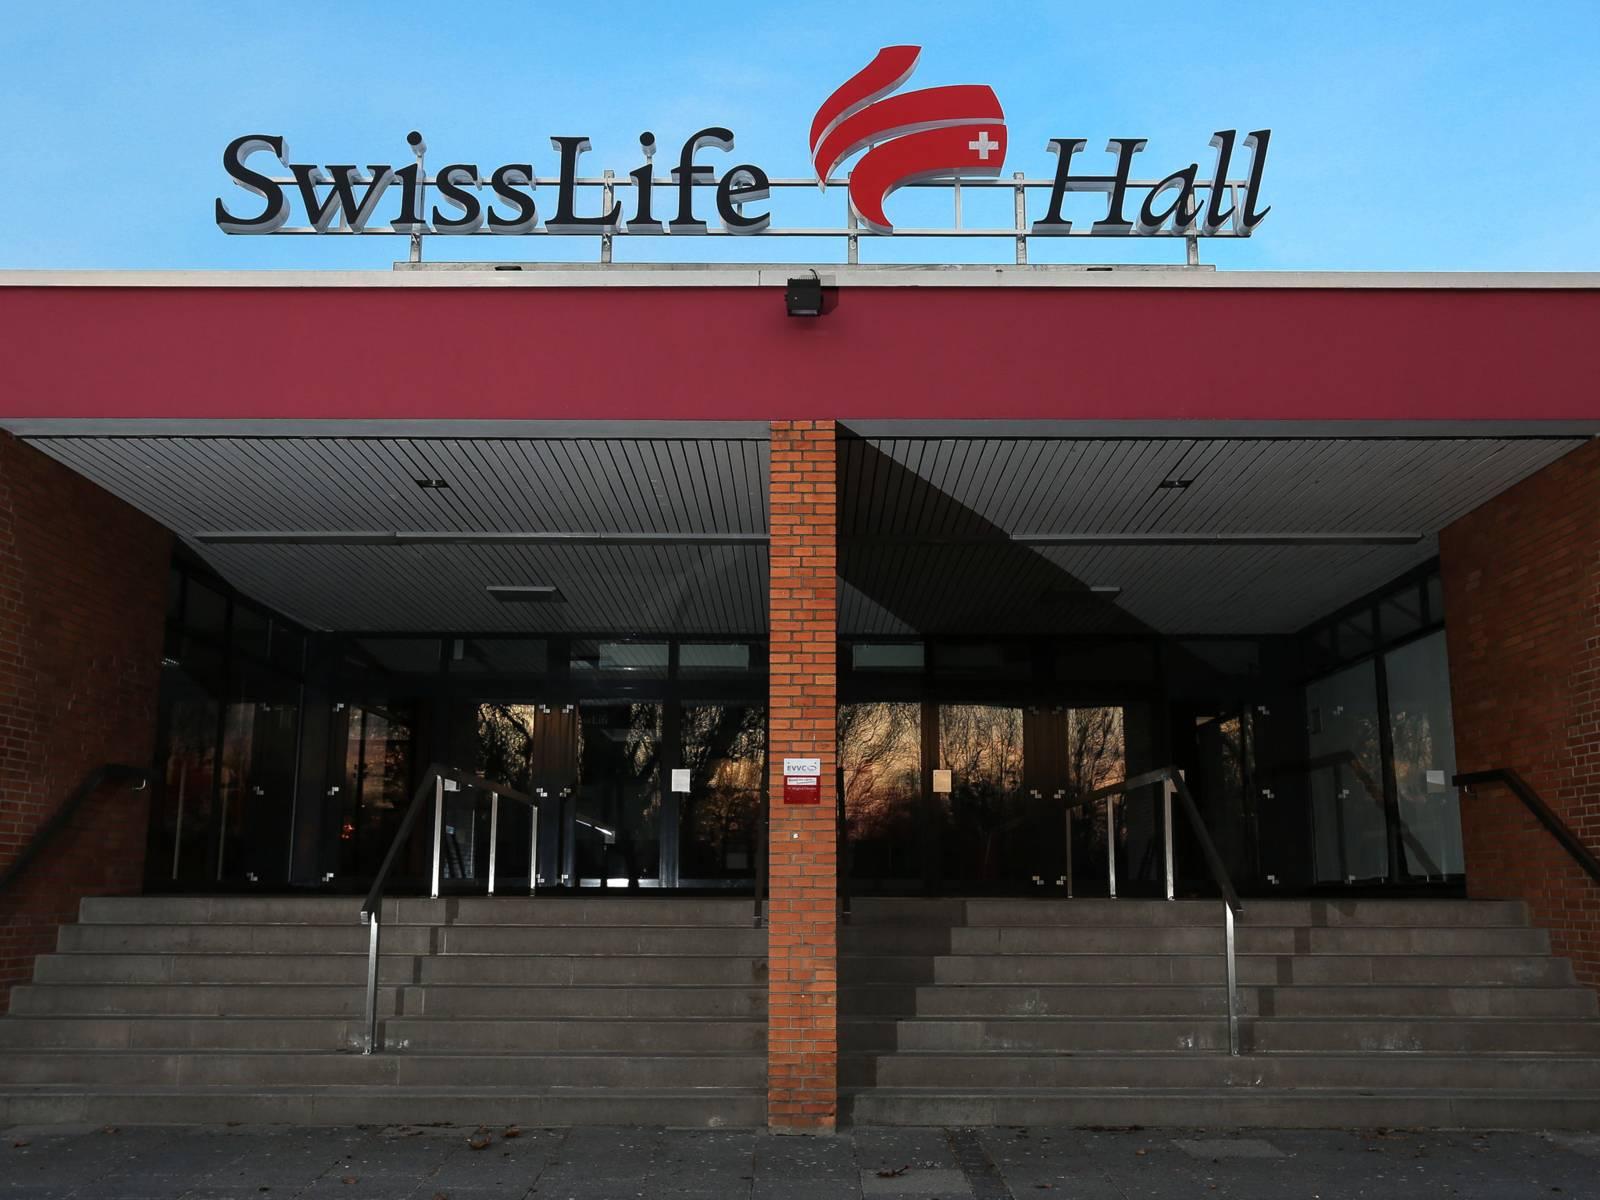 Der Eingang der Swiss Life Hall.